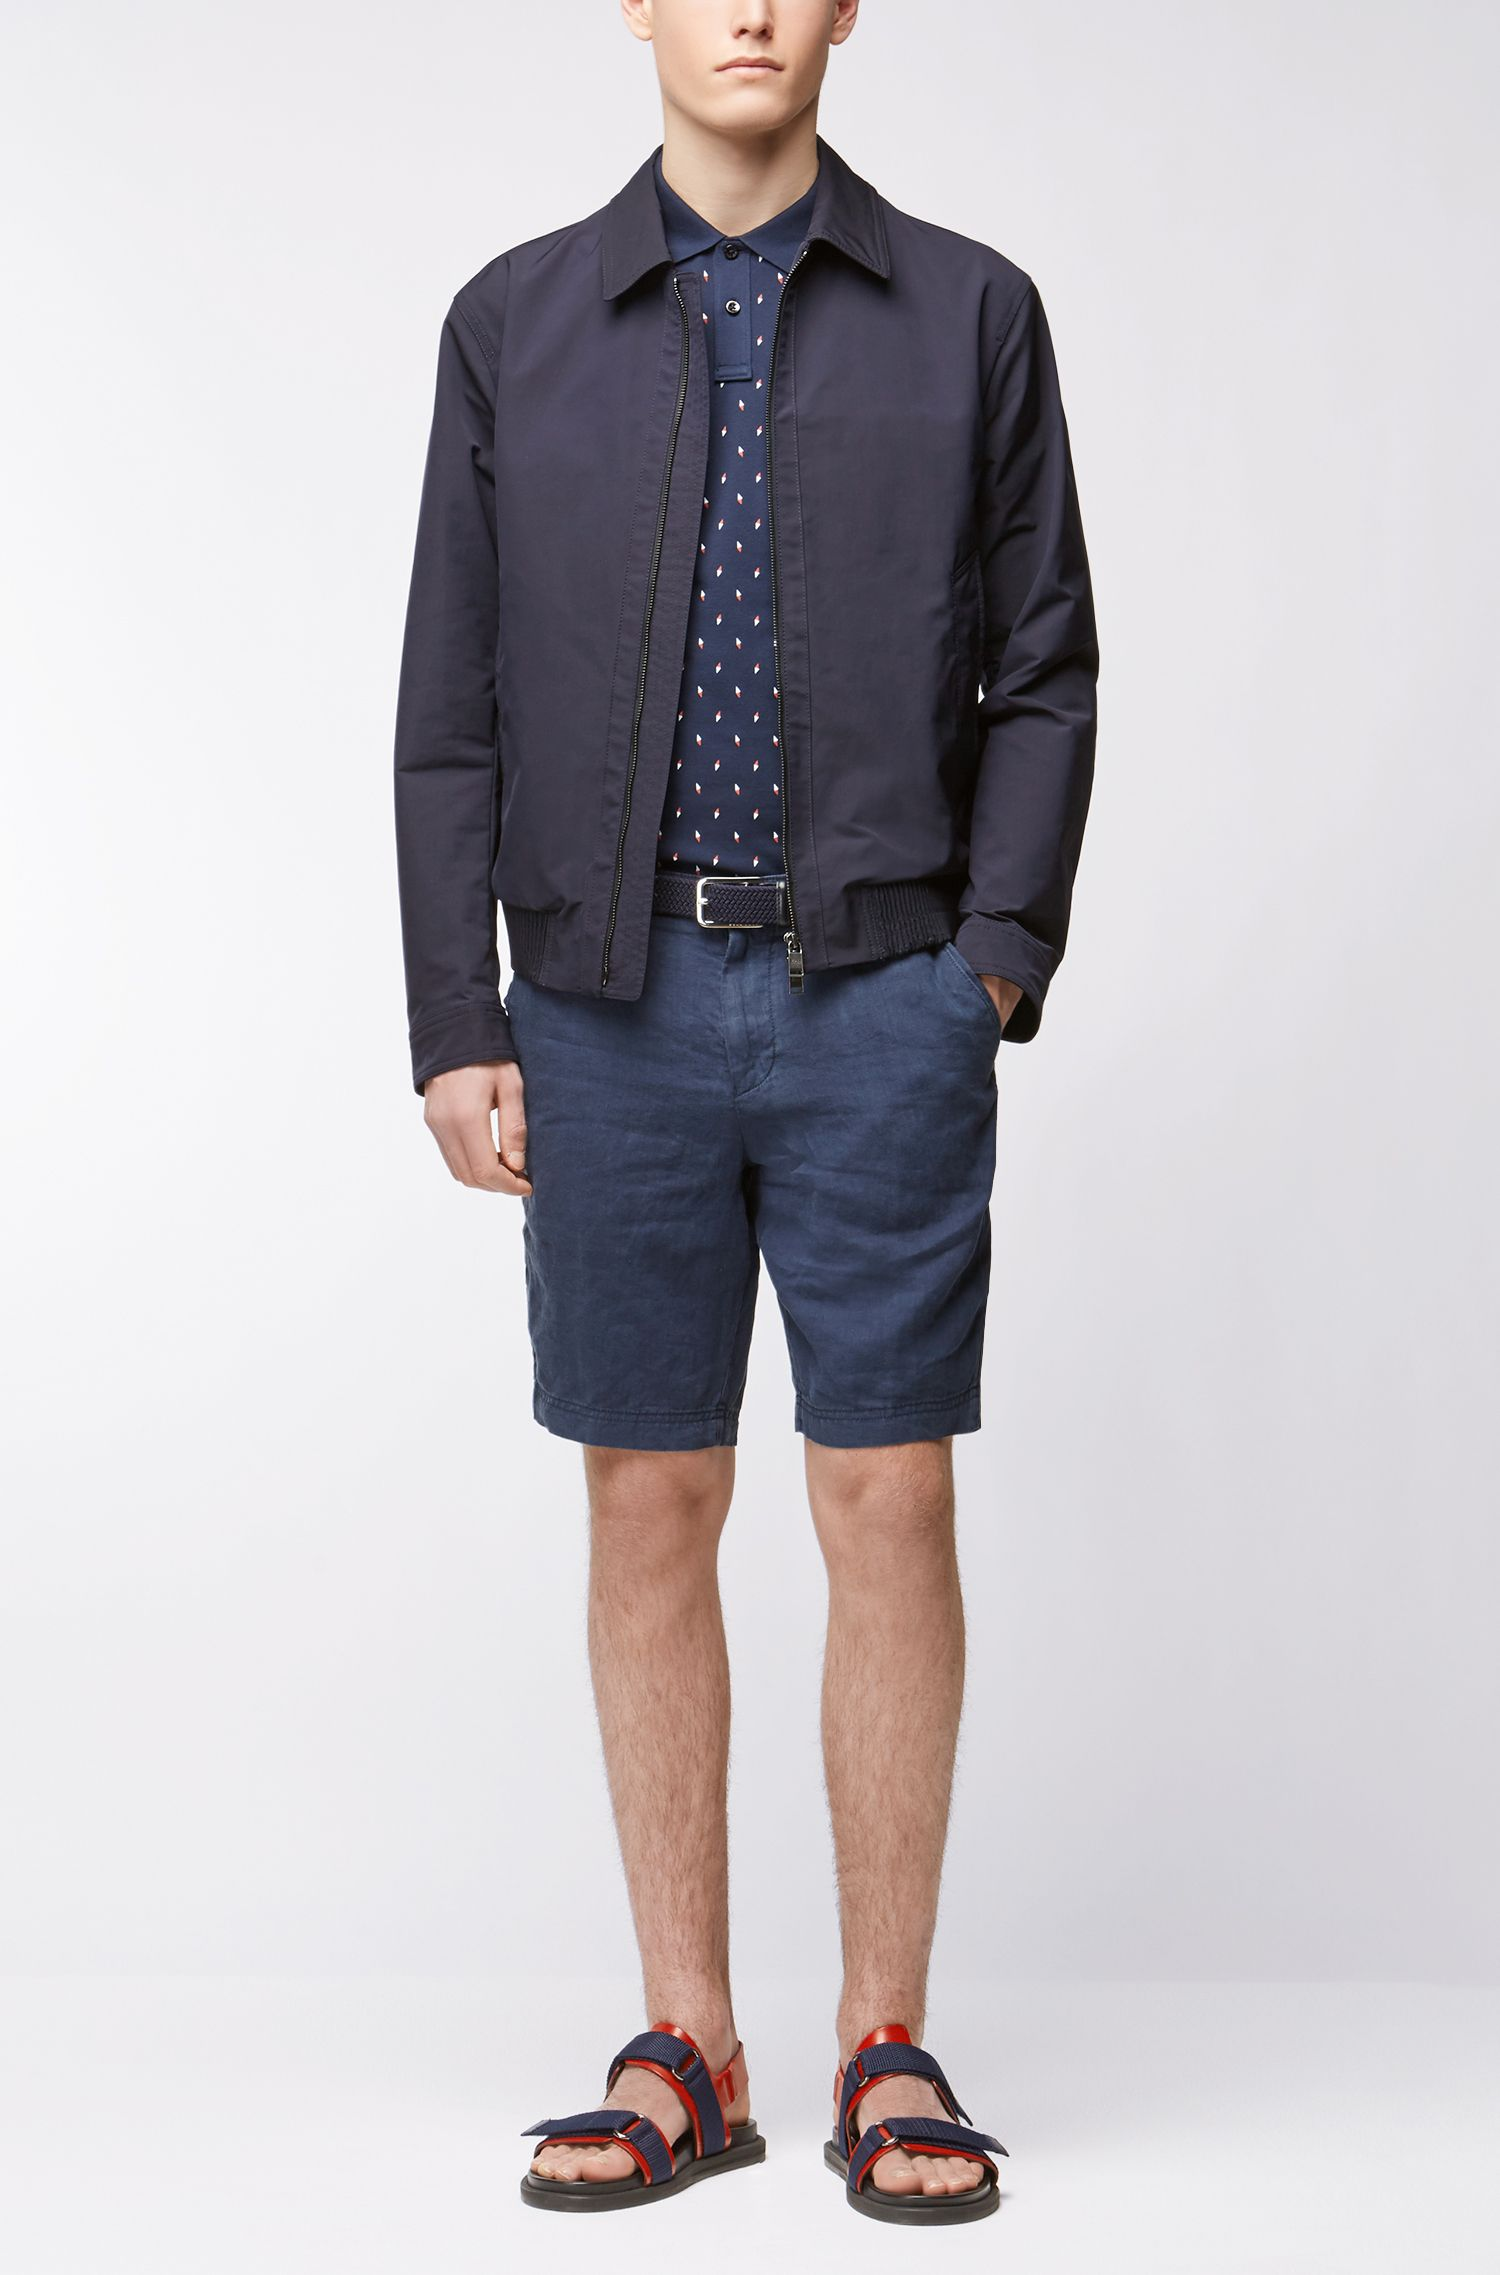 Cotton Blend Polo Shirt, Slim Fit | Plater 06